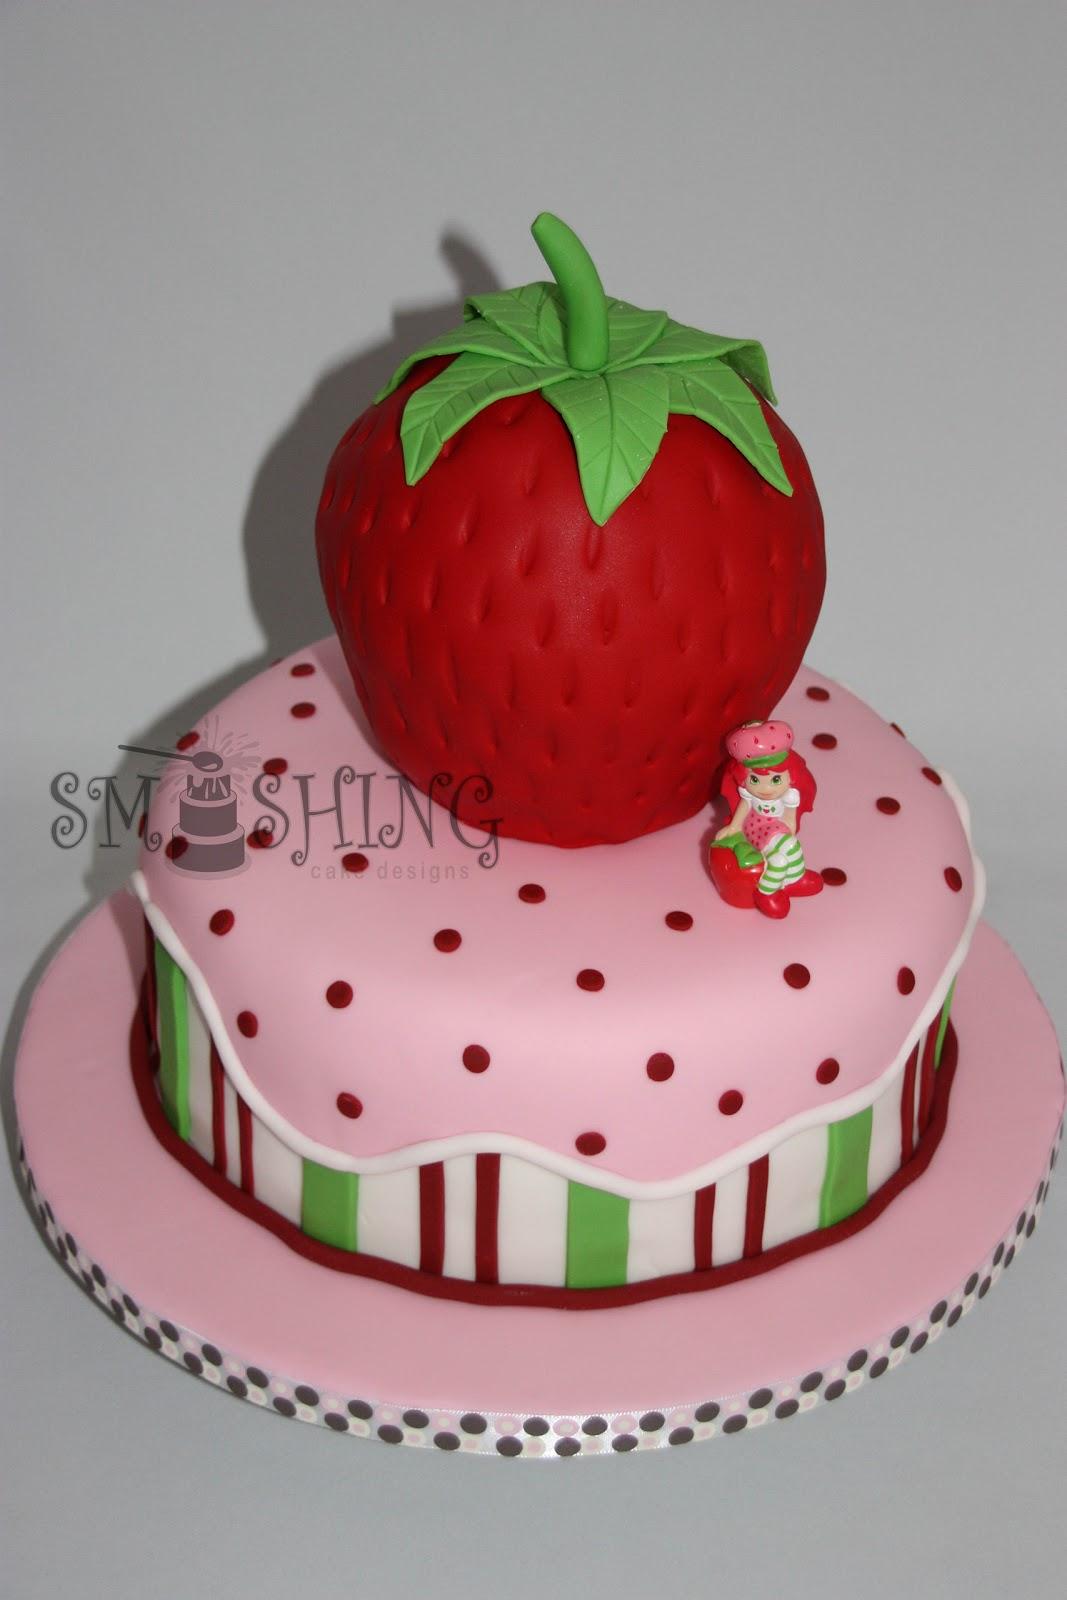 Smashing Cake Designs: Strawberry Shortcake